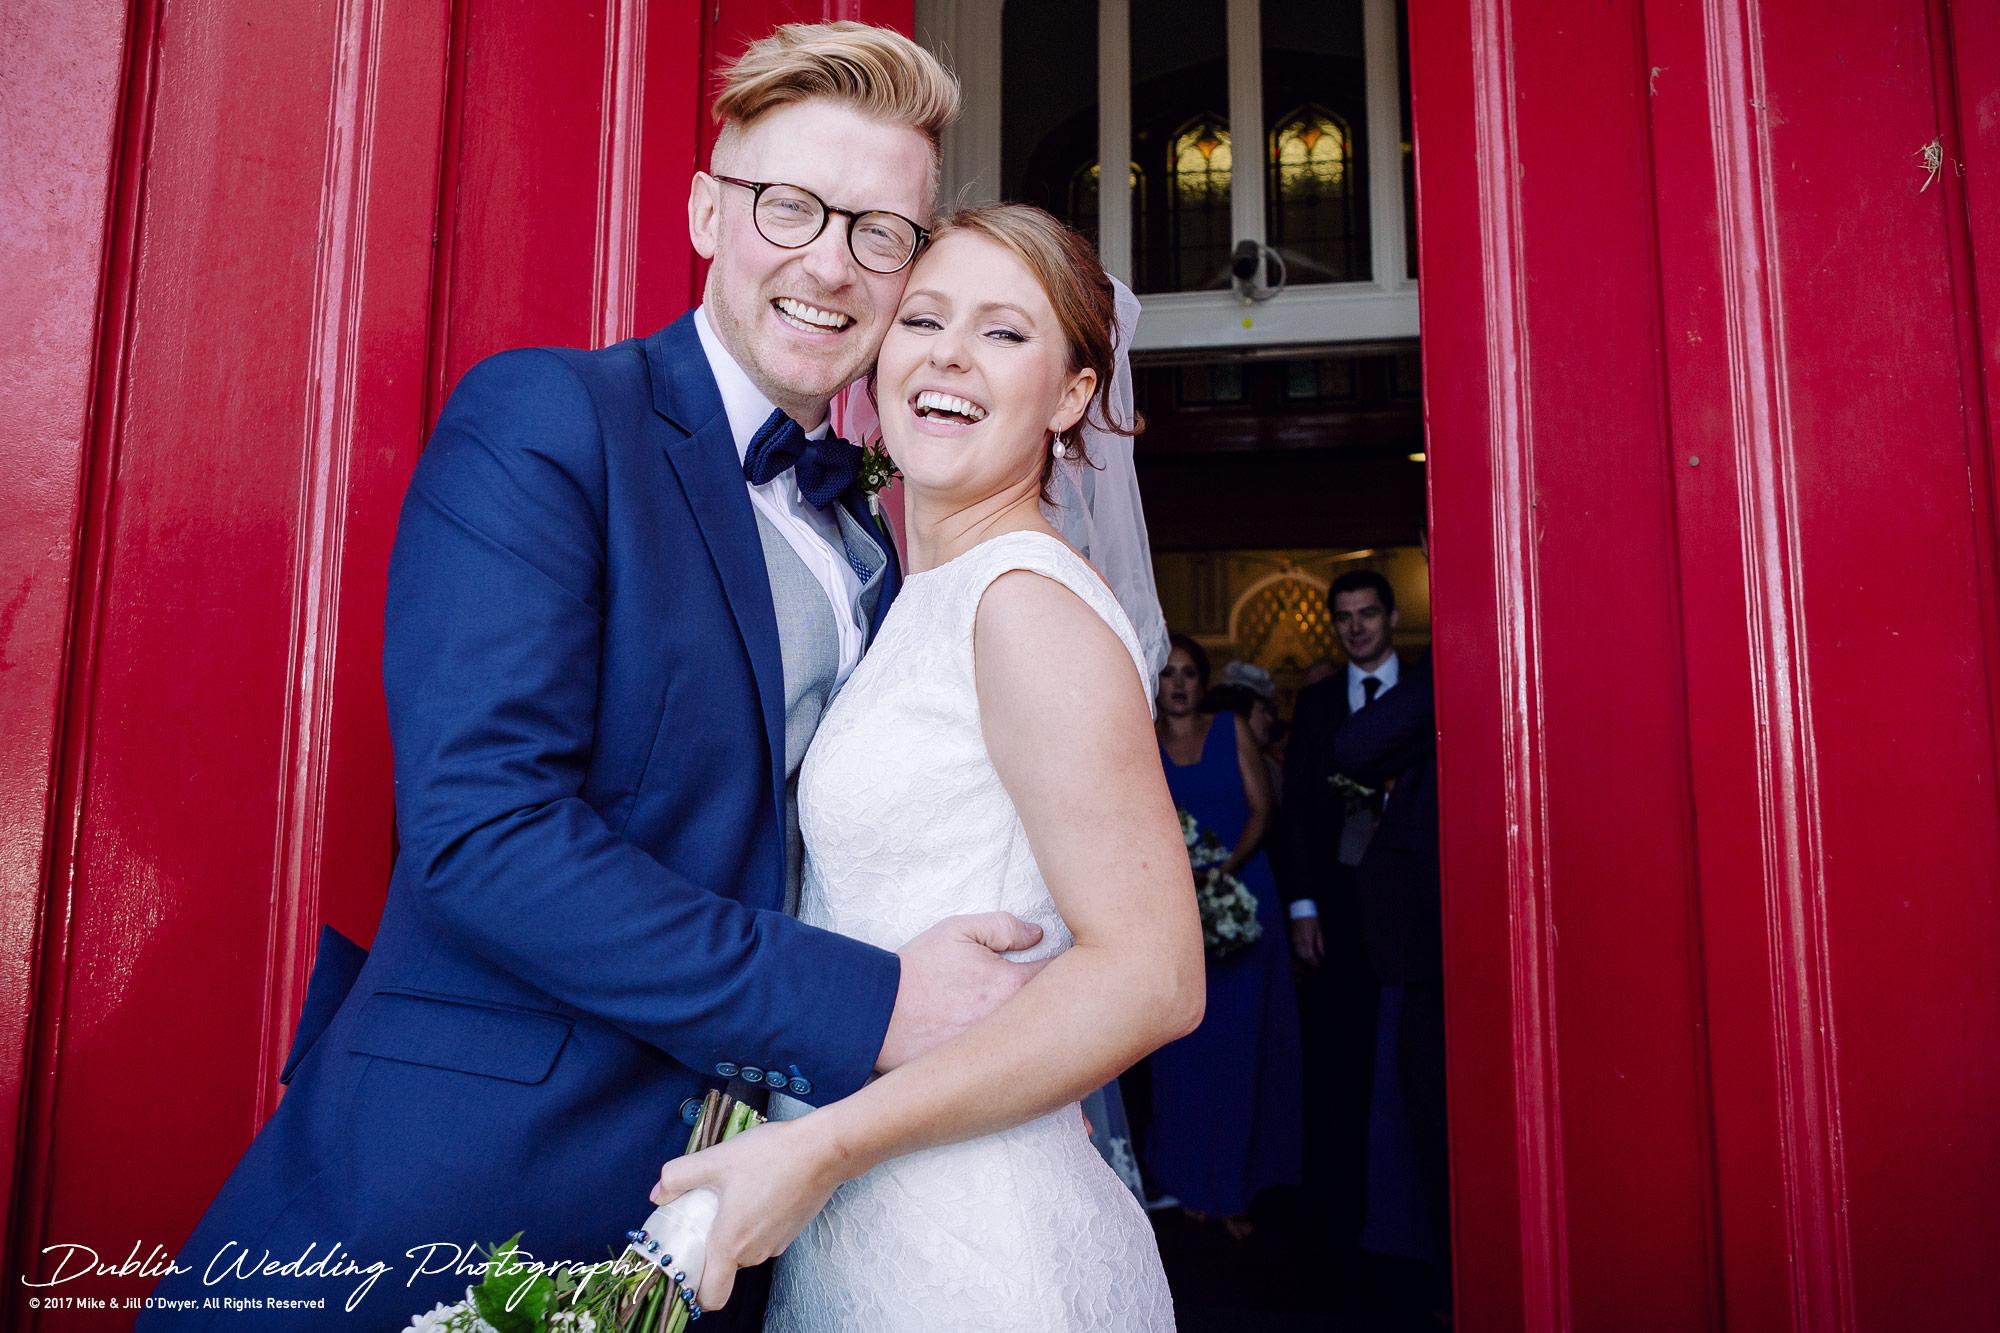 Tinakilly House Wedding Photographer: Bride & Groom at Church Entrance